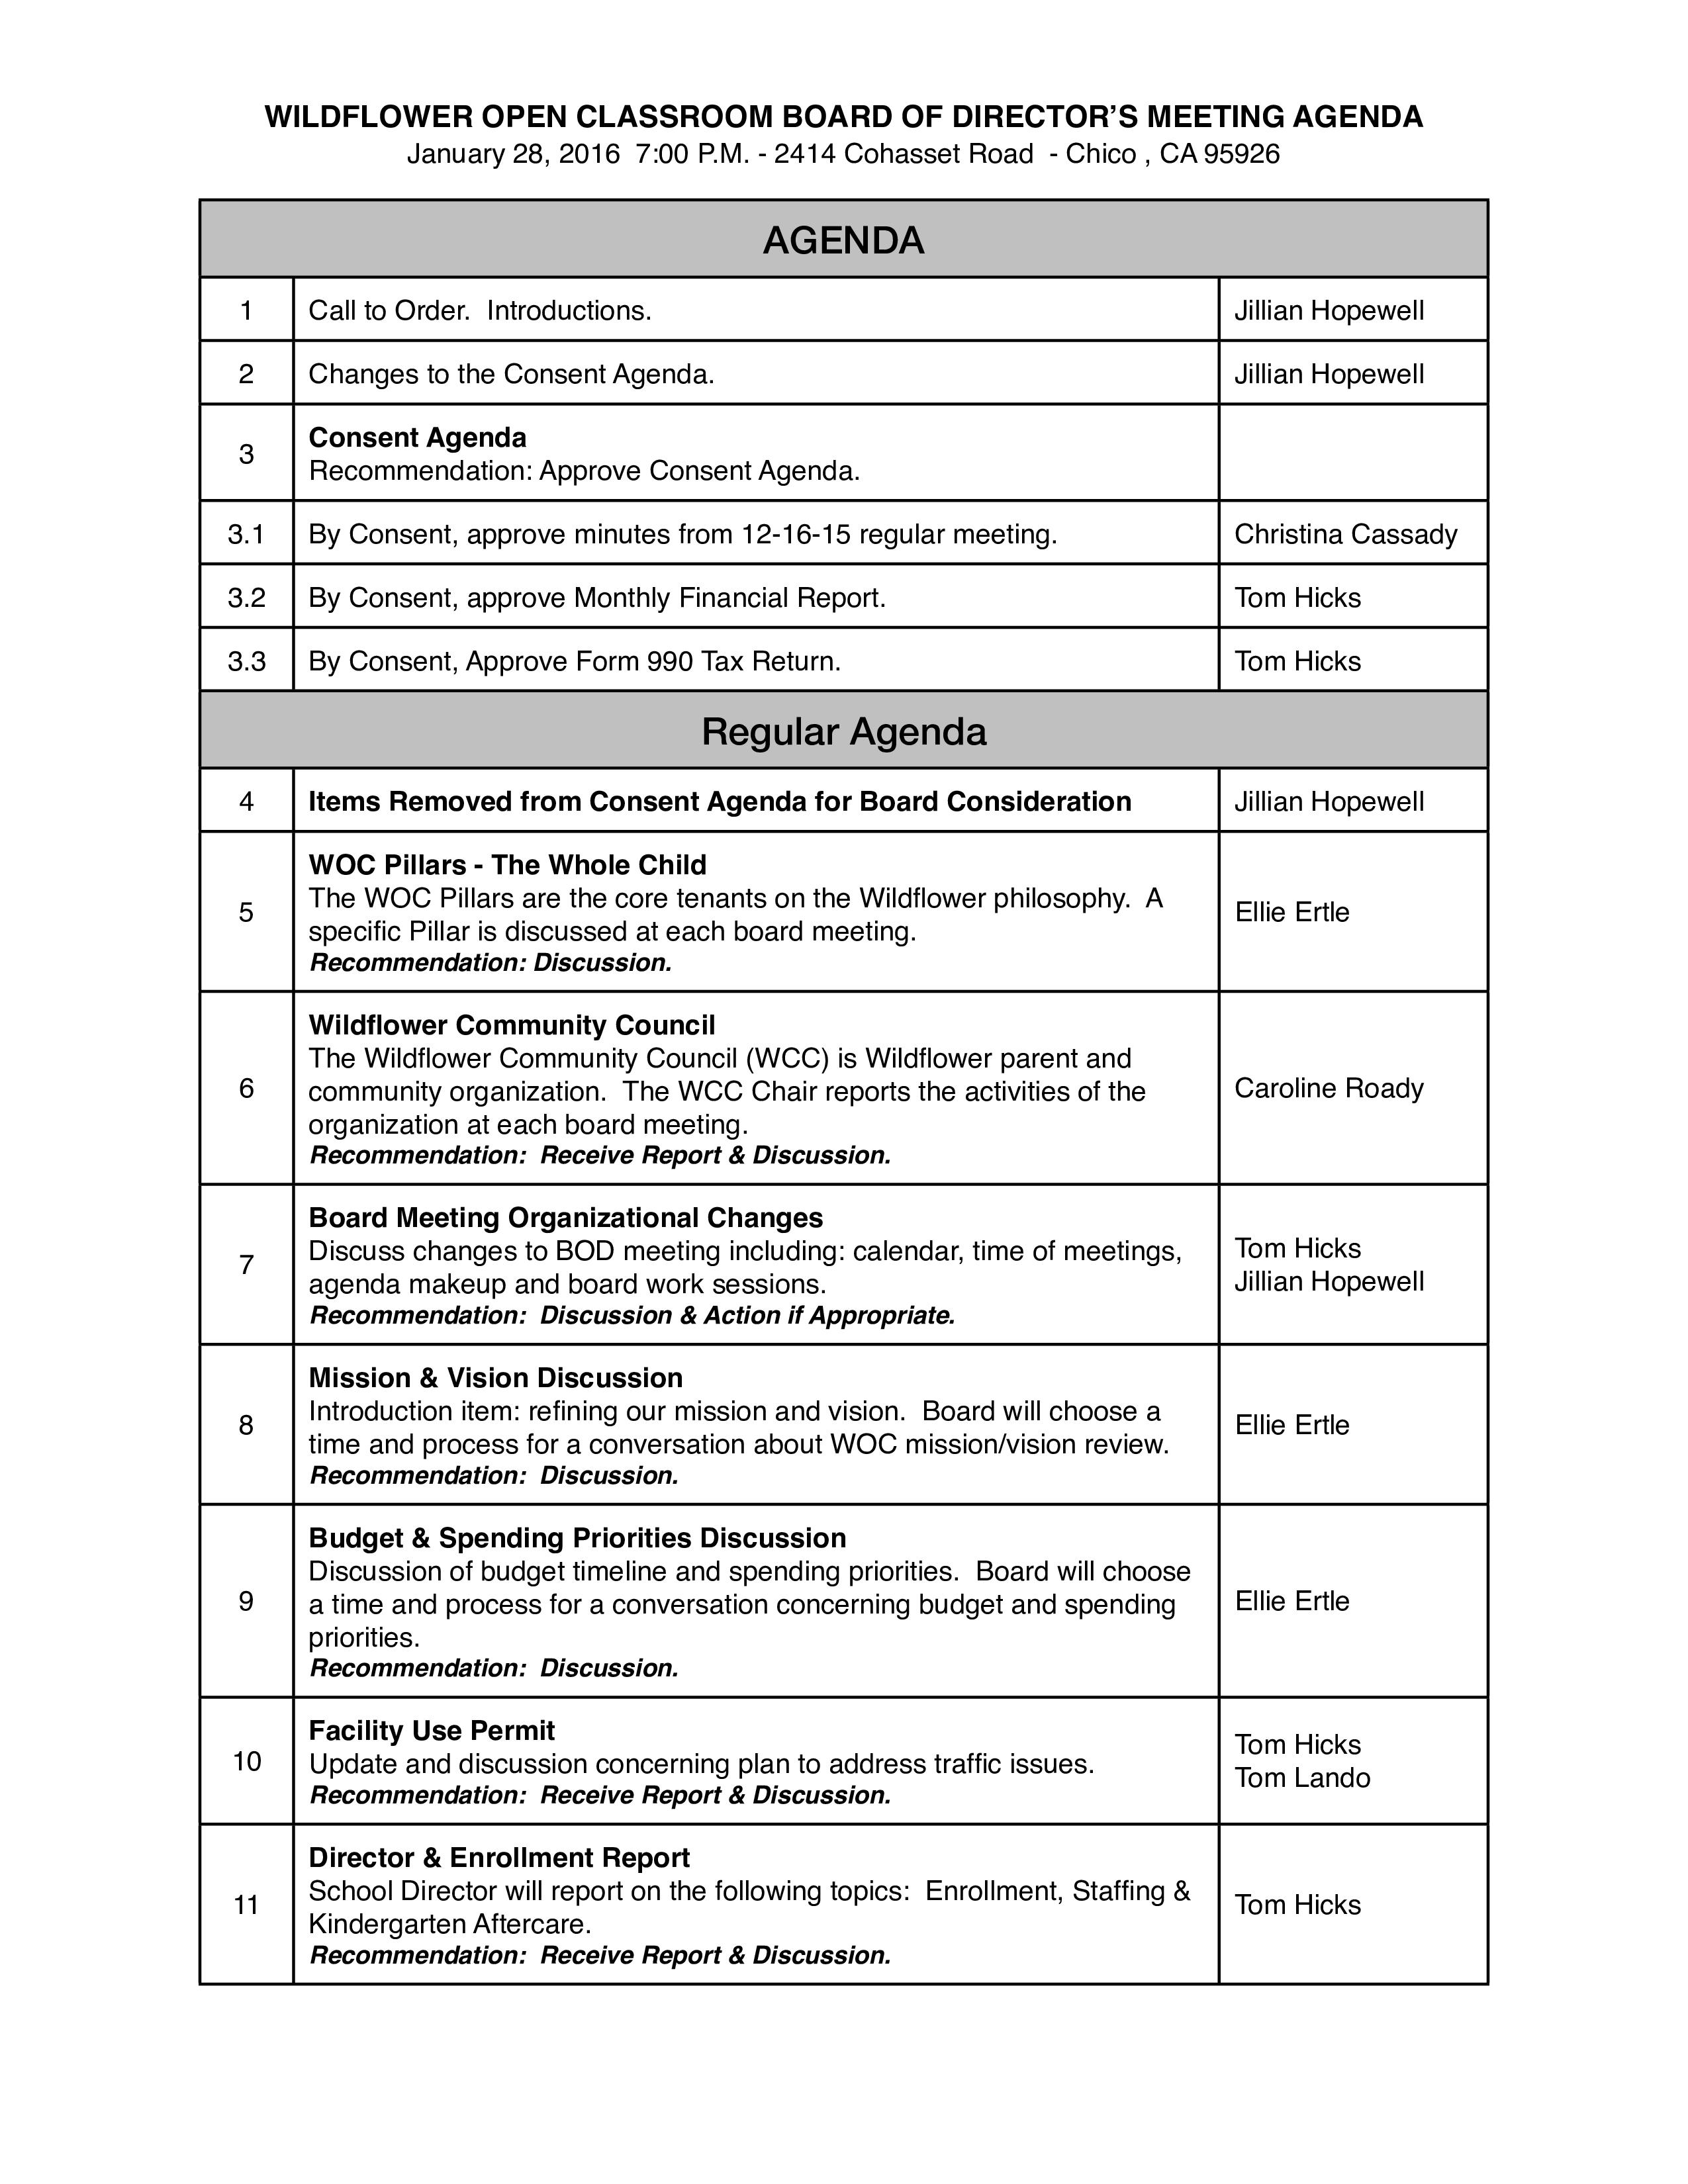 Free vision board agenda templates at allbusinesstemplates vision board agenda main image download template maxwellsz